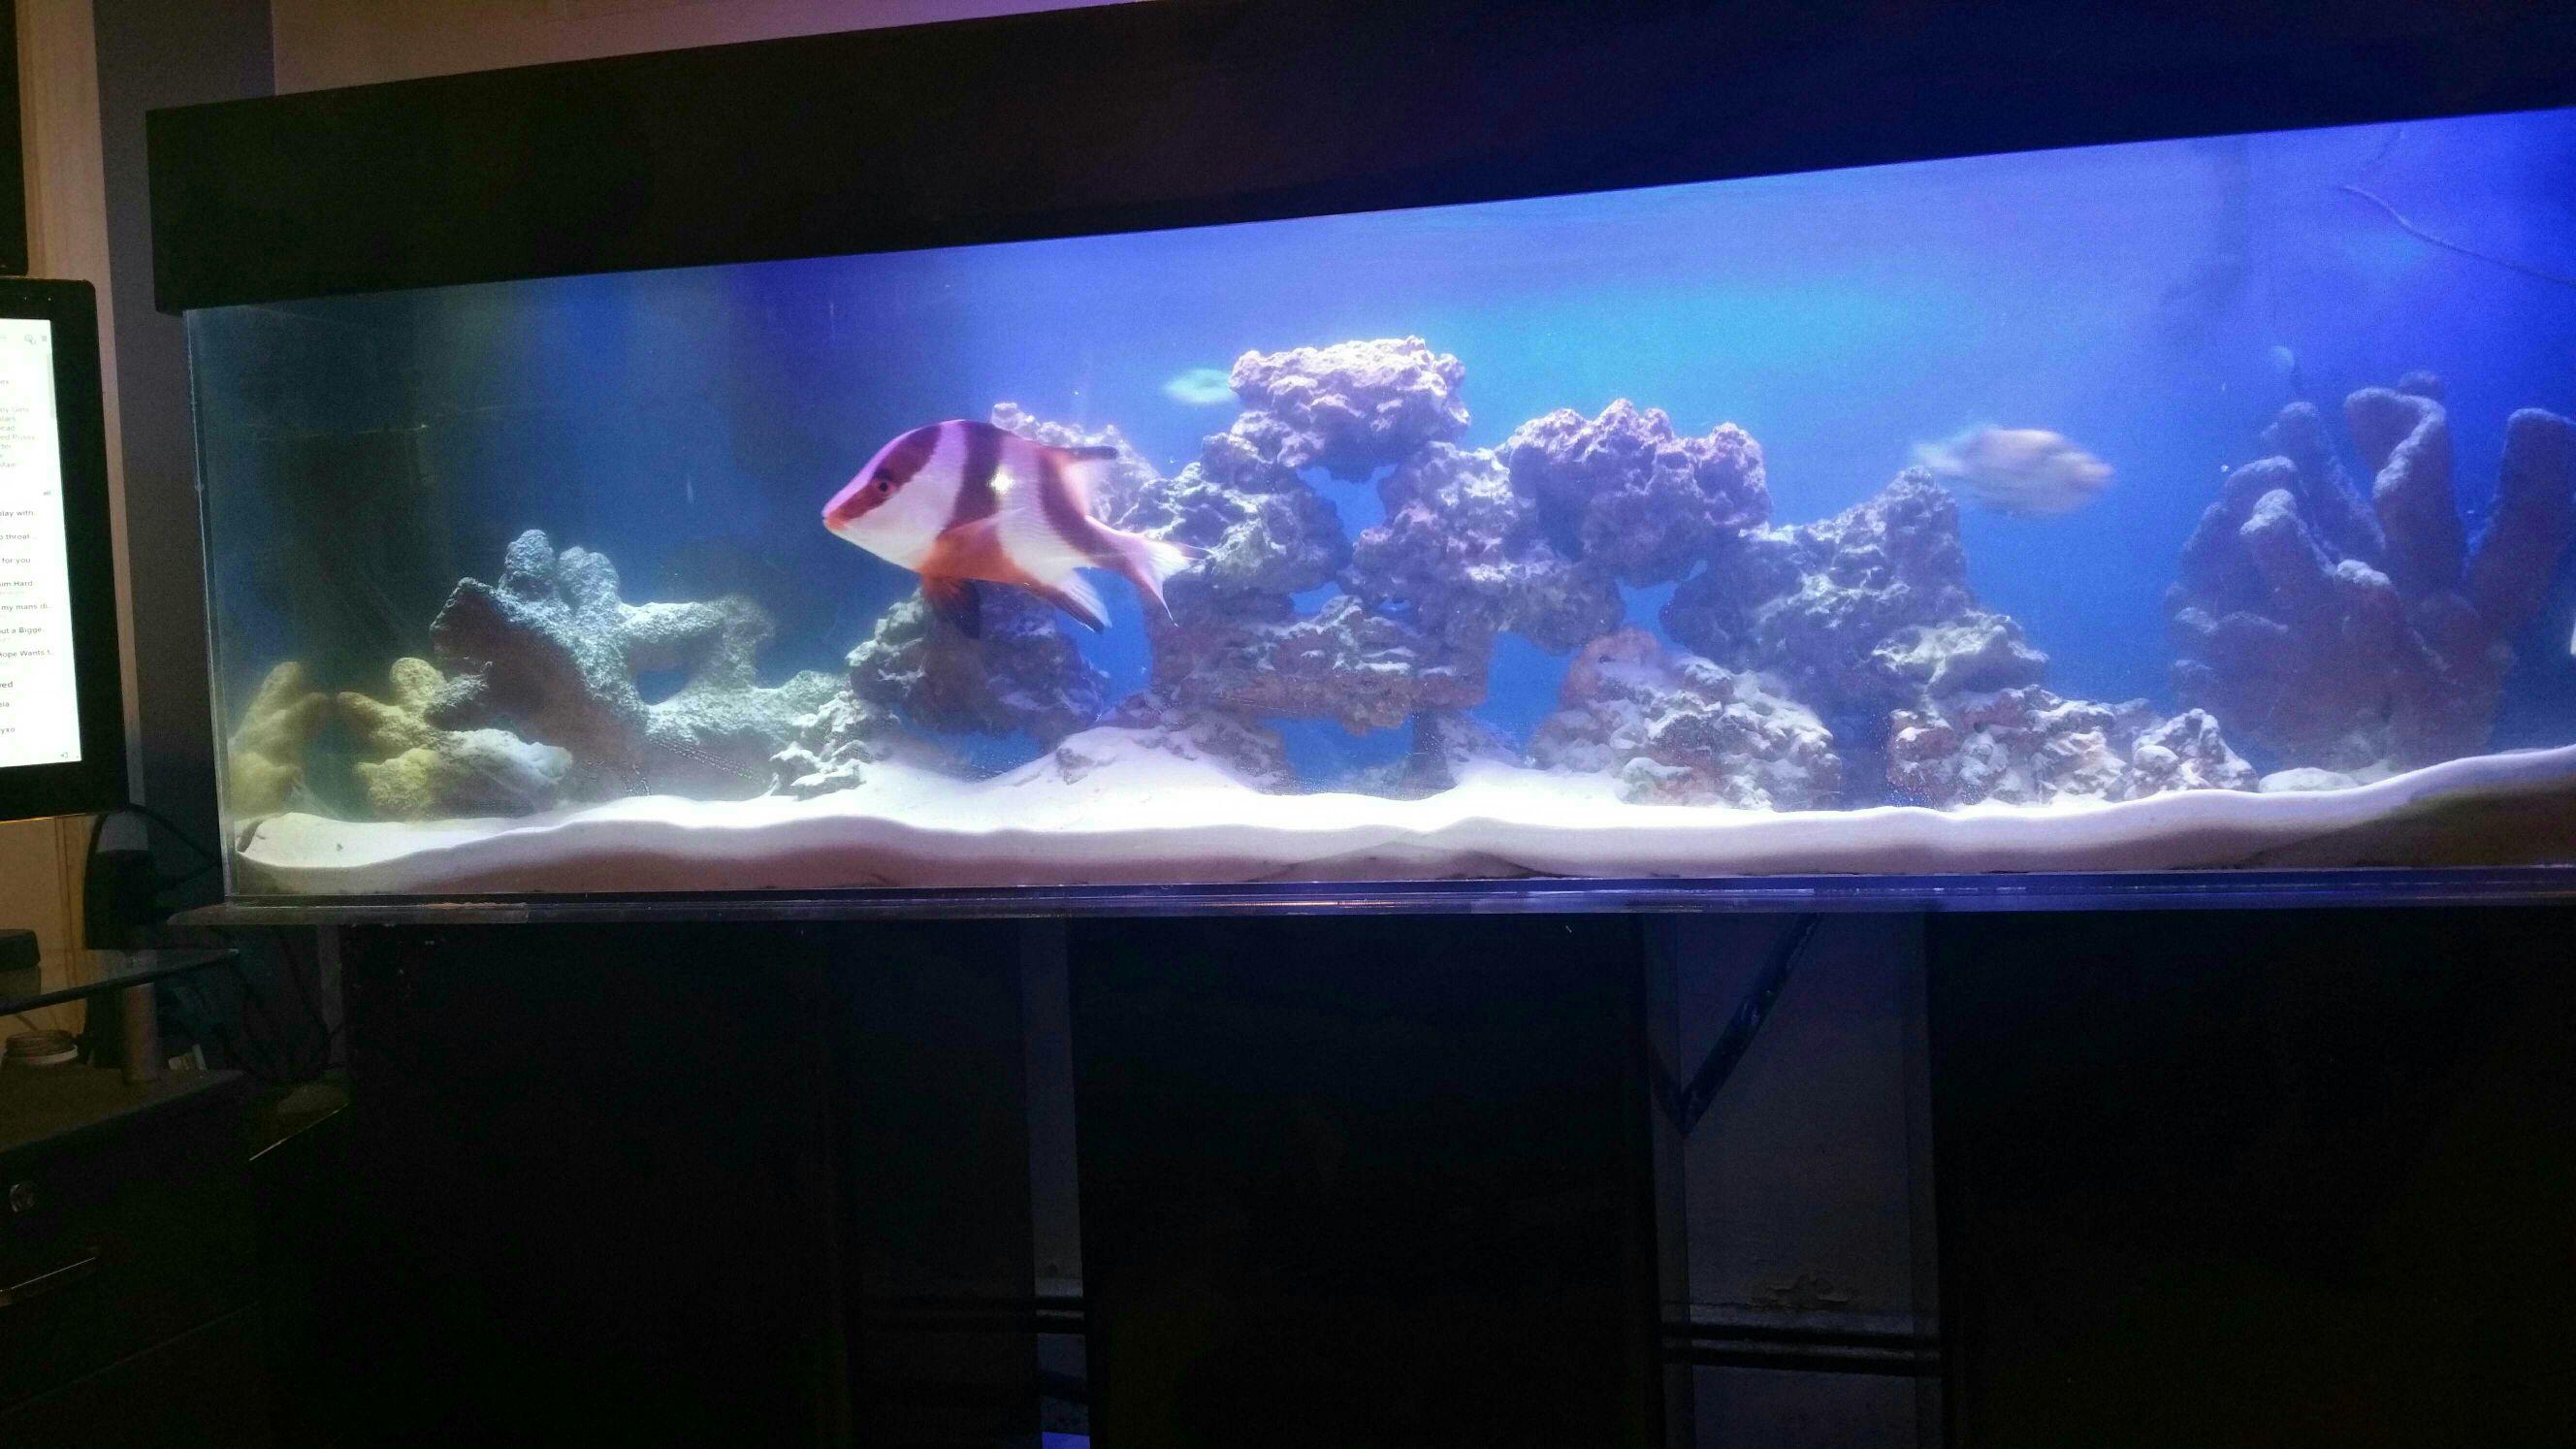 Best company to buy 125 gallon acrylic aquarium advice for 125 gallon fish tank stand